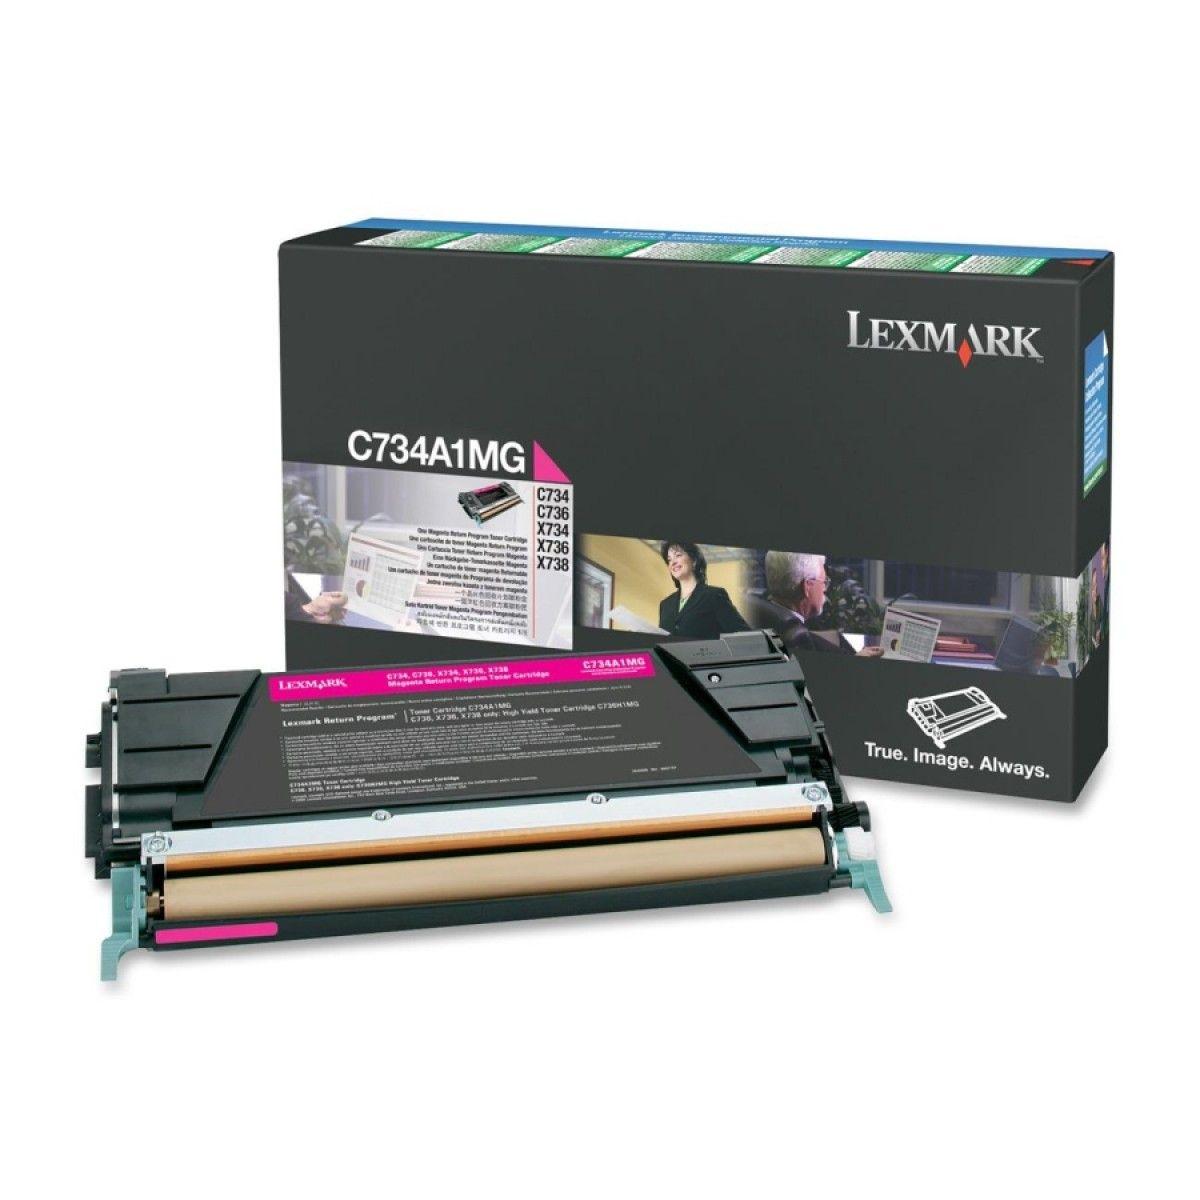 Toner Lexmark C734/6/X734/736 Magenta - C734A1MG